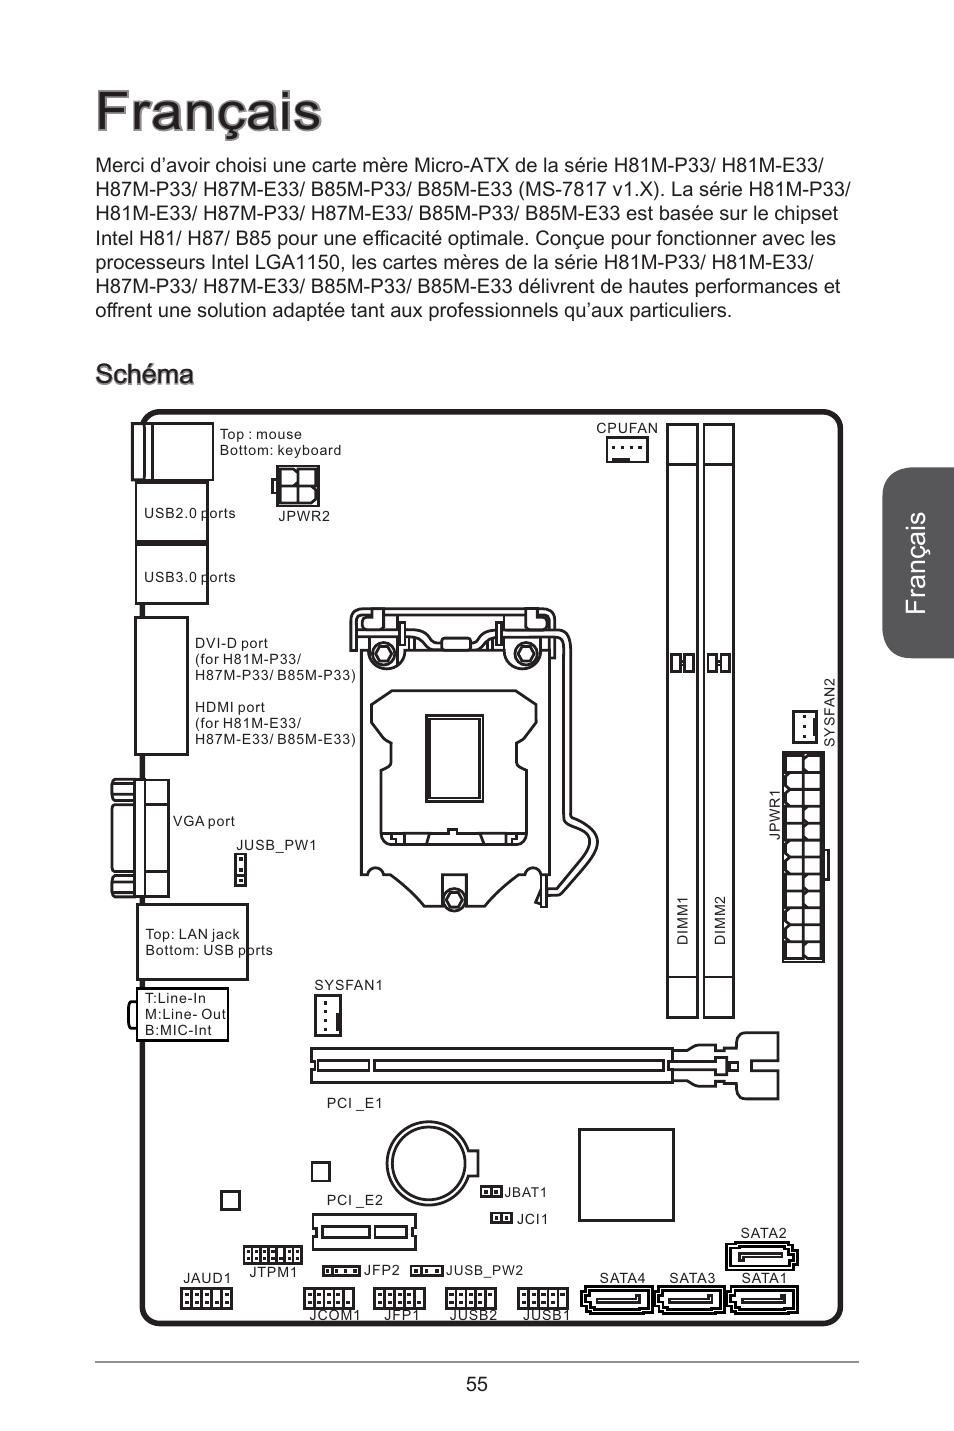 msi b85m p33 page55 fran�ais, sch�ma msi b85m p33 user manual page 55 186  at alyssarenee.co